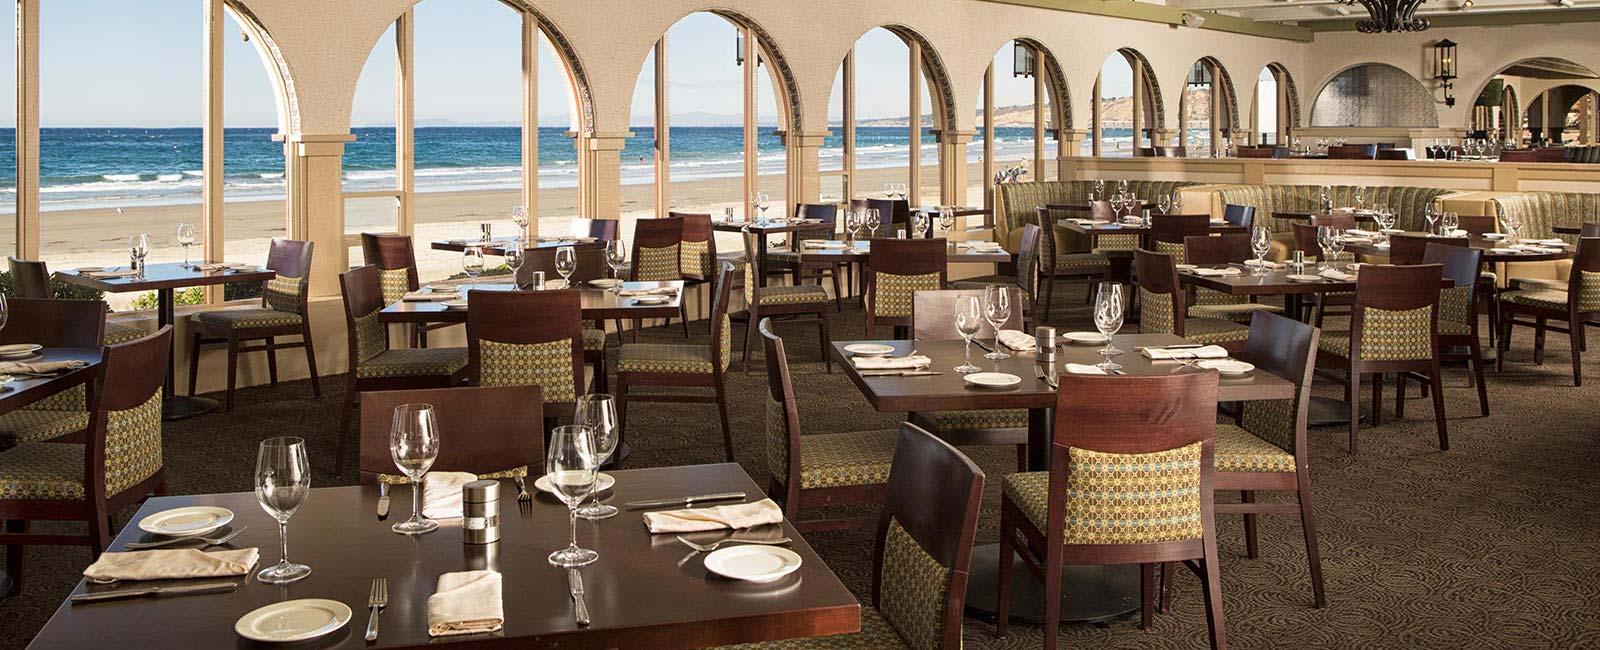 Site Map of The Shores Restaurant, La Jolla